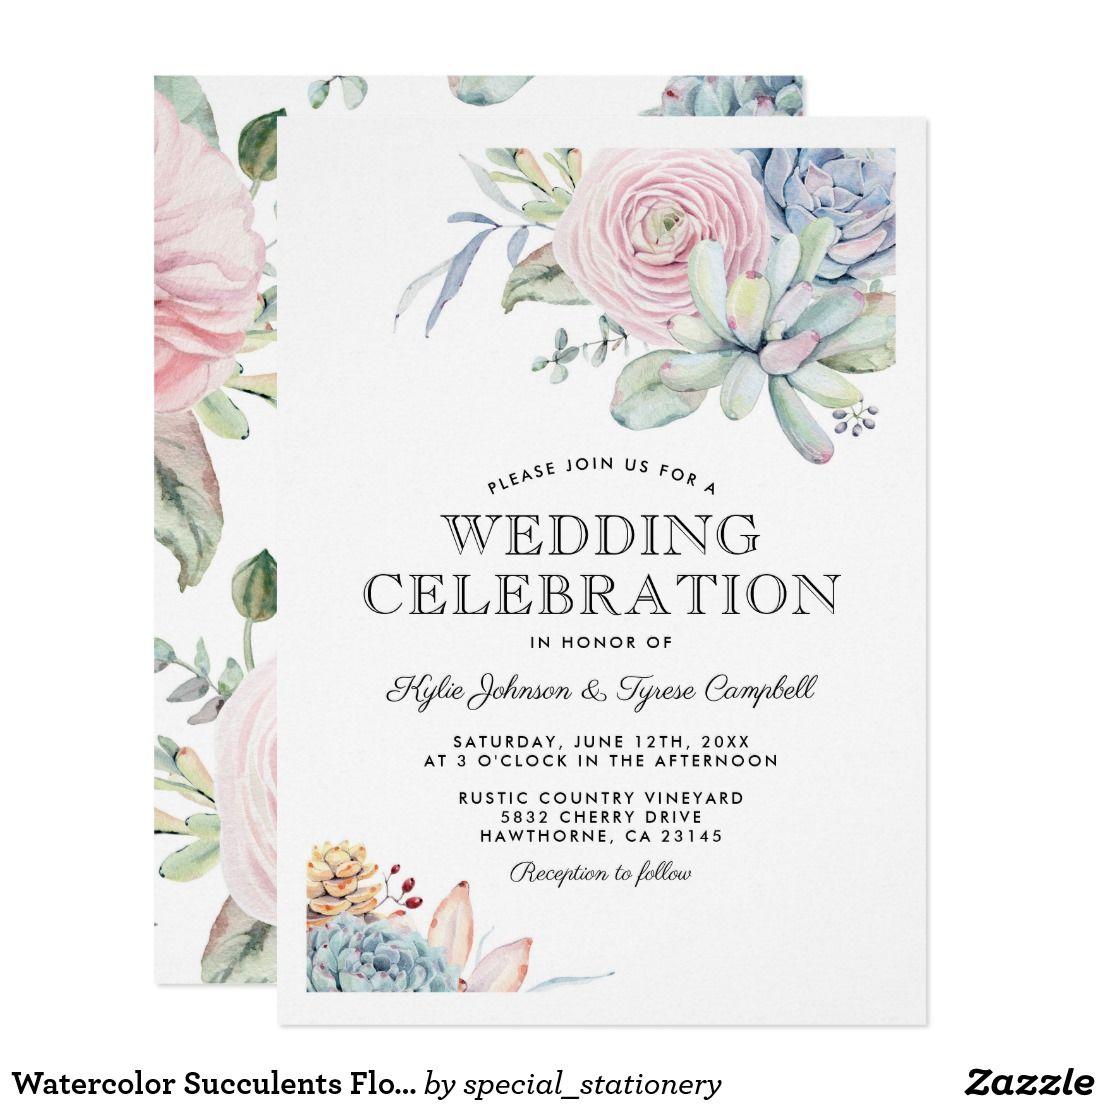 Watercolor Succulents Floral Bloom Vintage Wedding Card Elegant ...